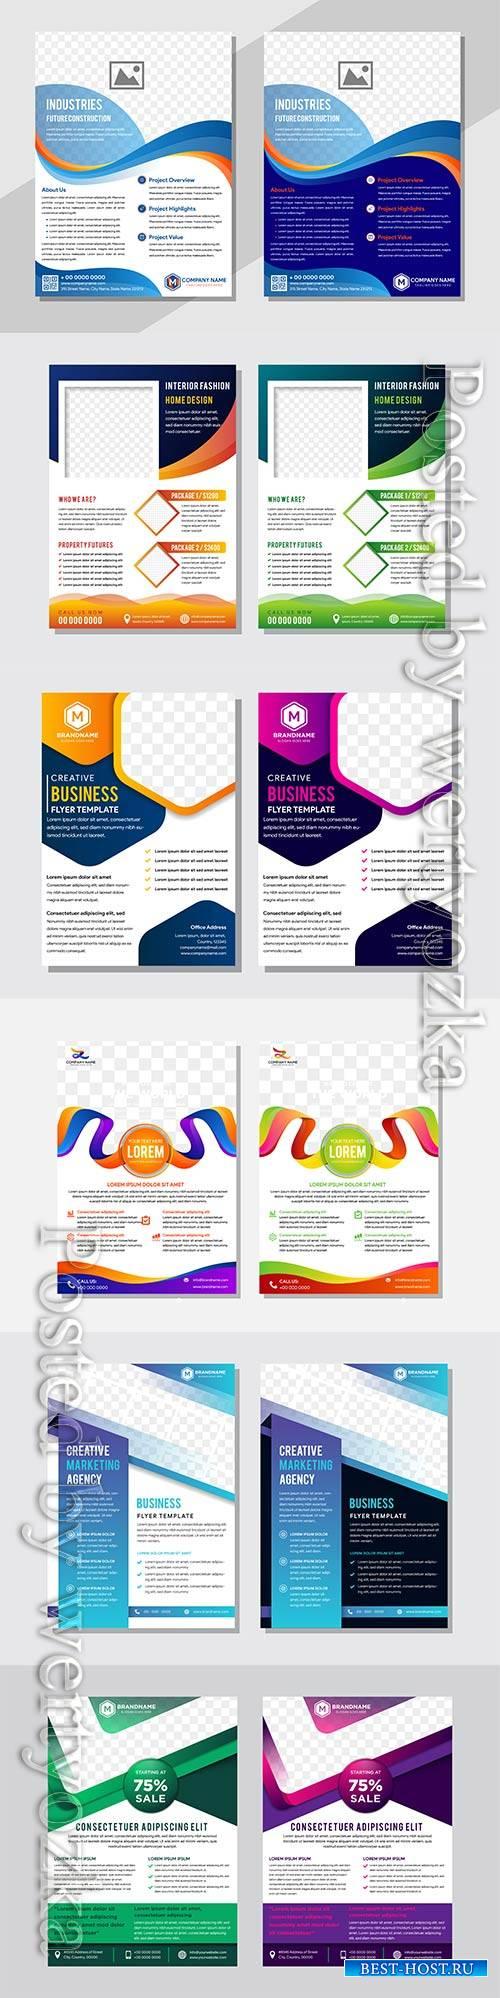 Business vector design template for brochure, flyer